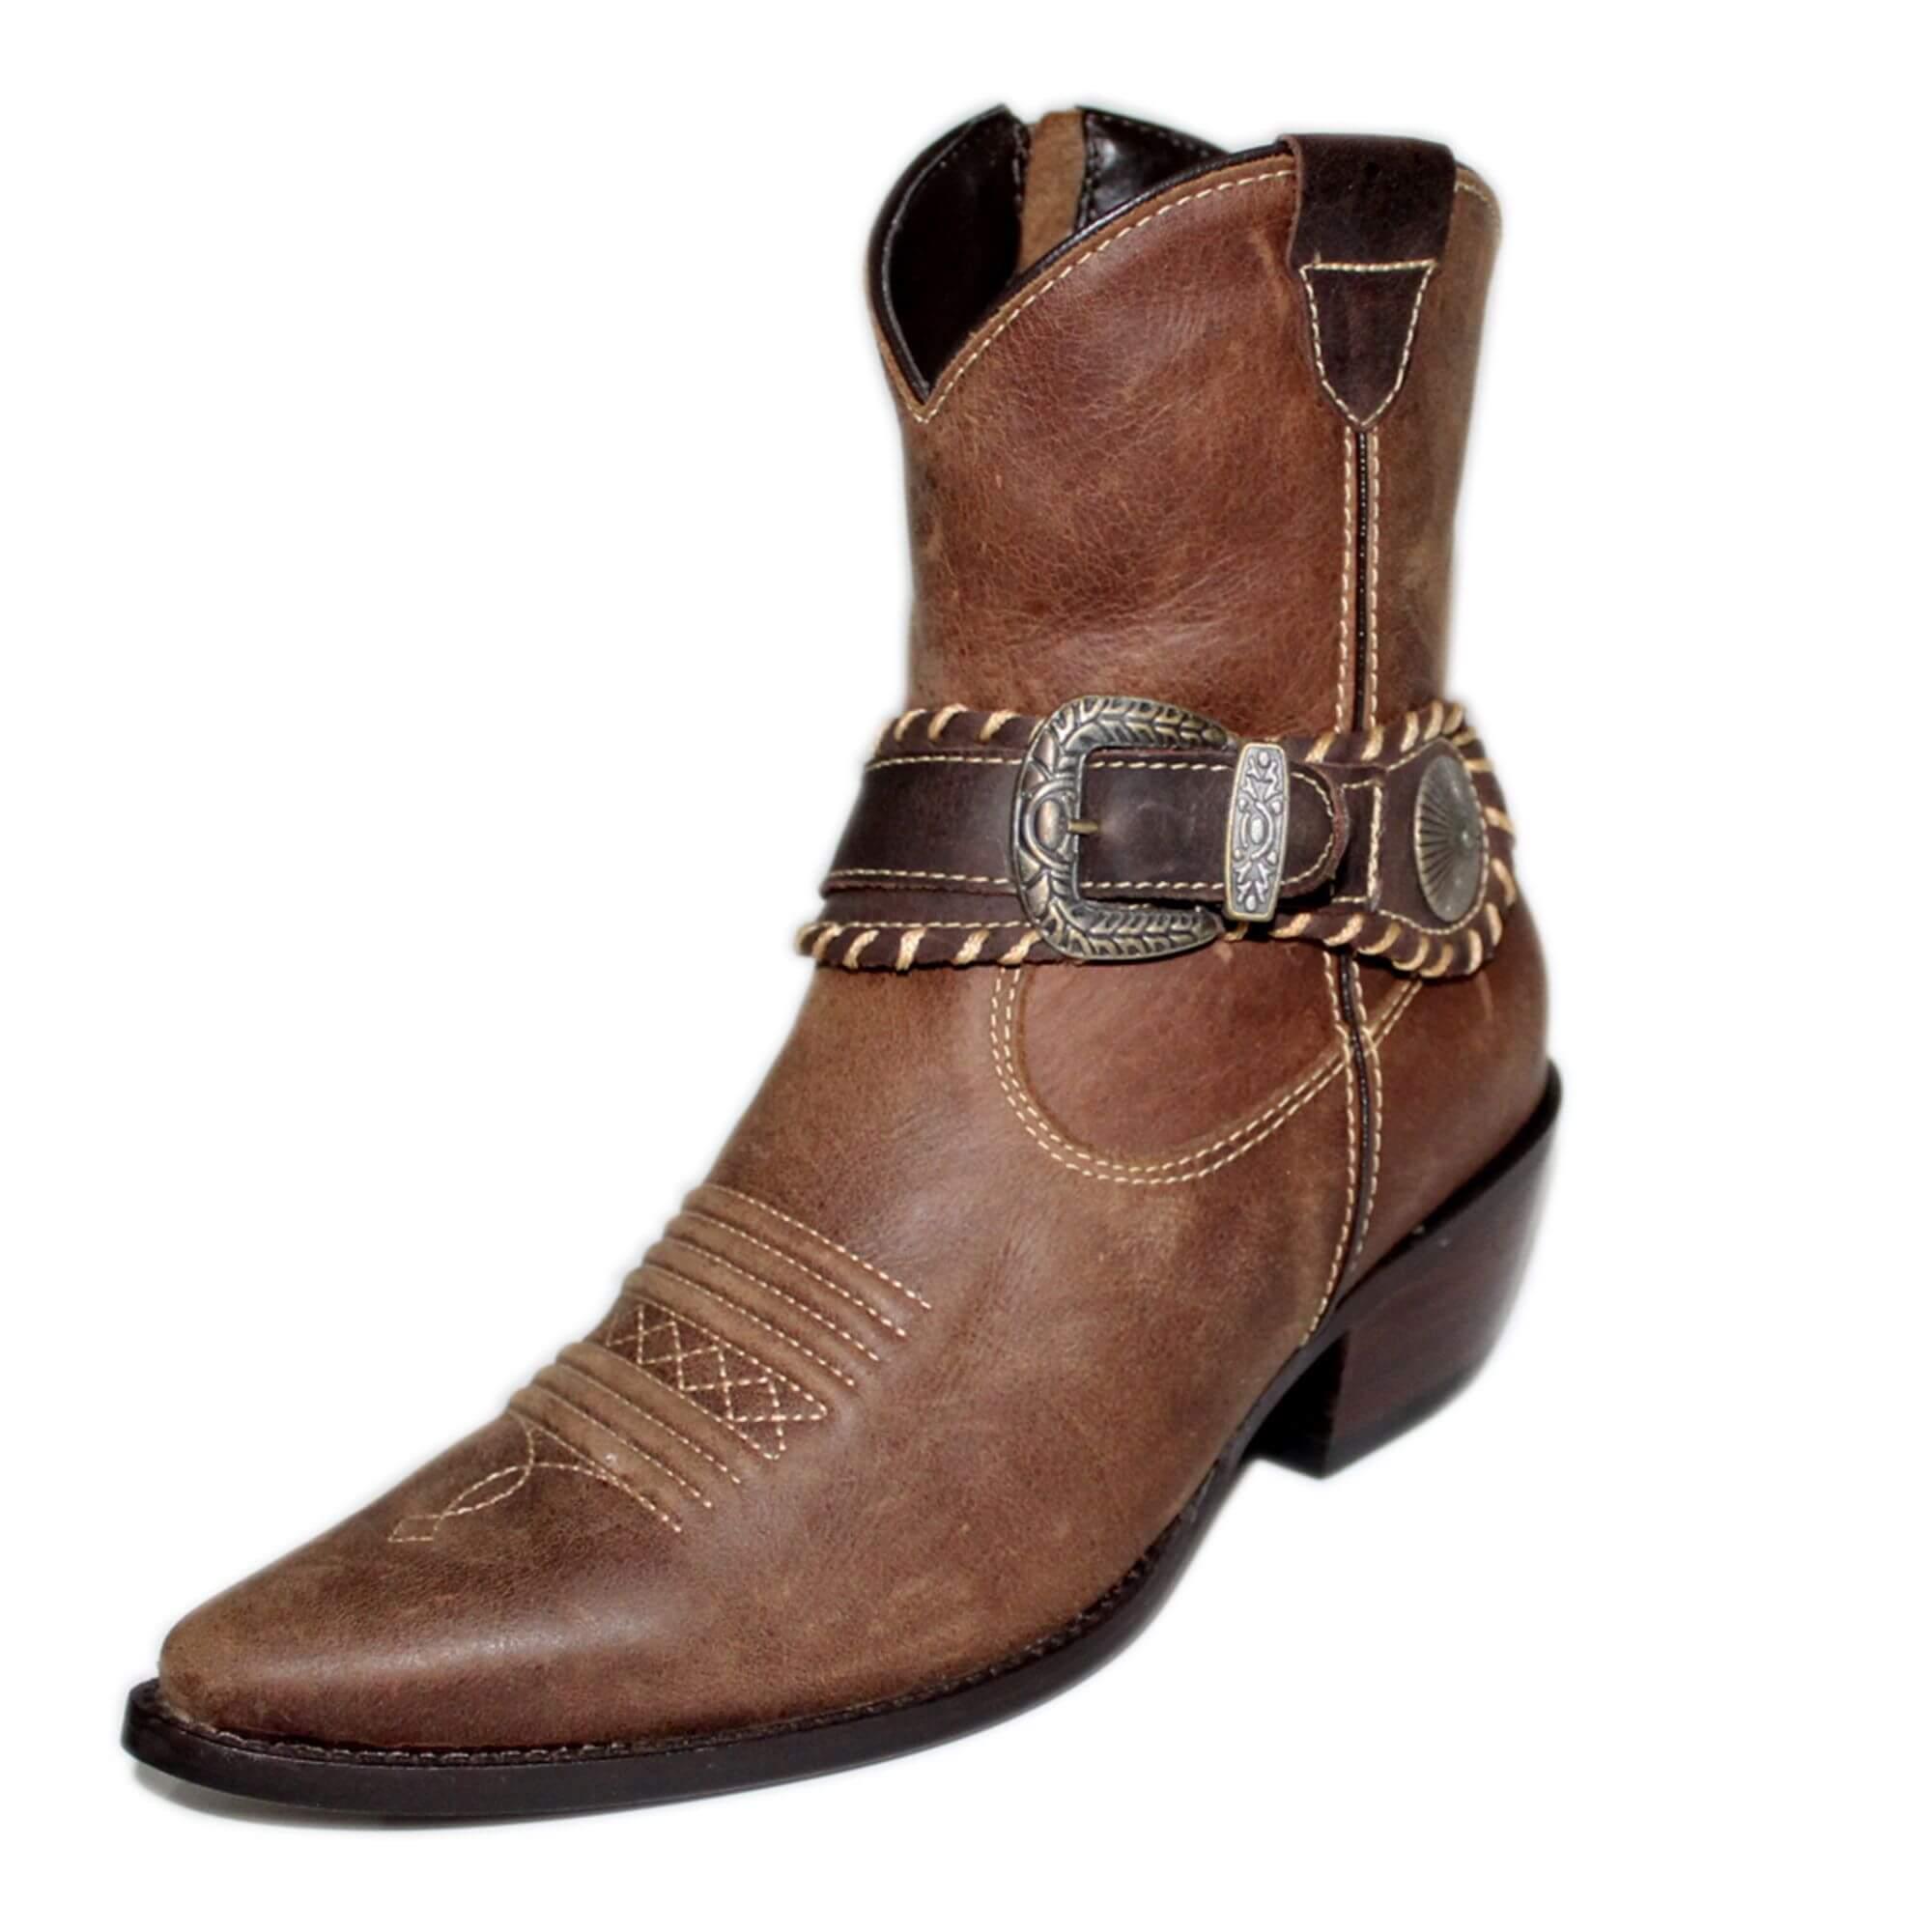 ef7f42280a Bota Vimar Boots Feminina Couro Brown Taupe - Arena Country Echaporã